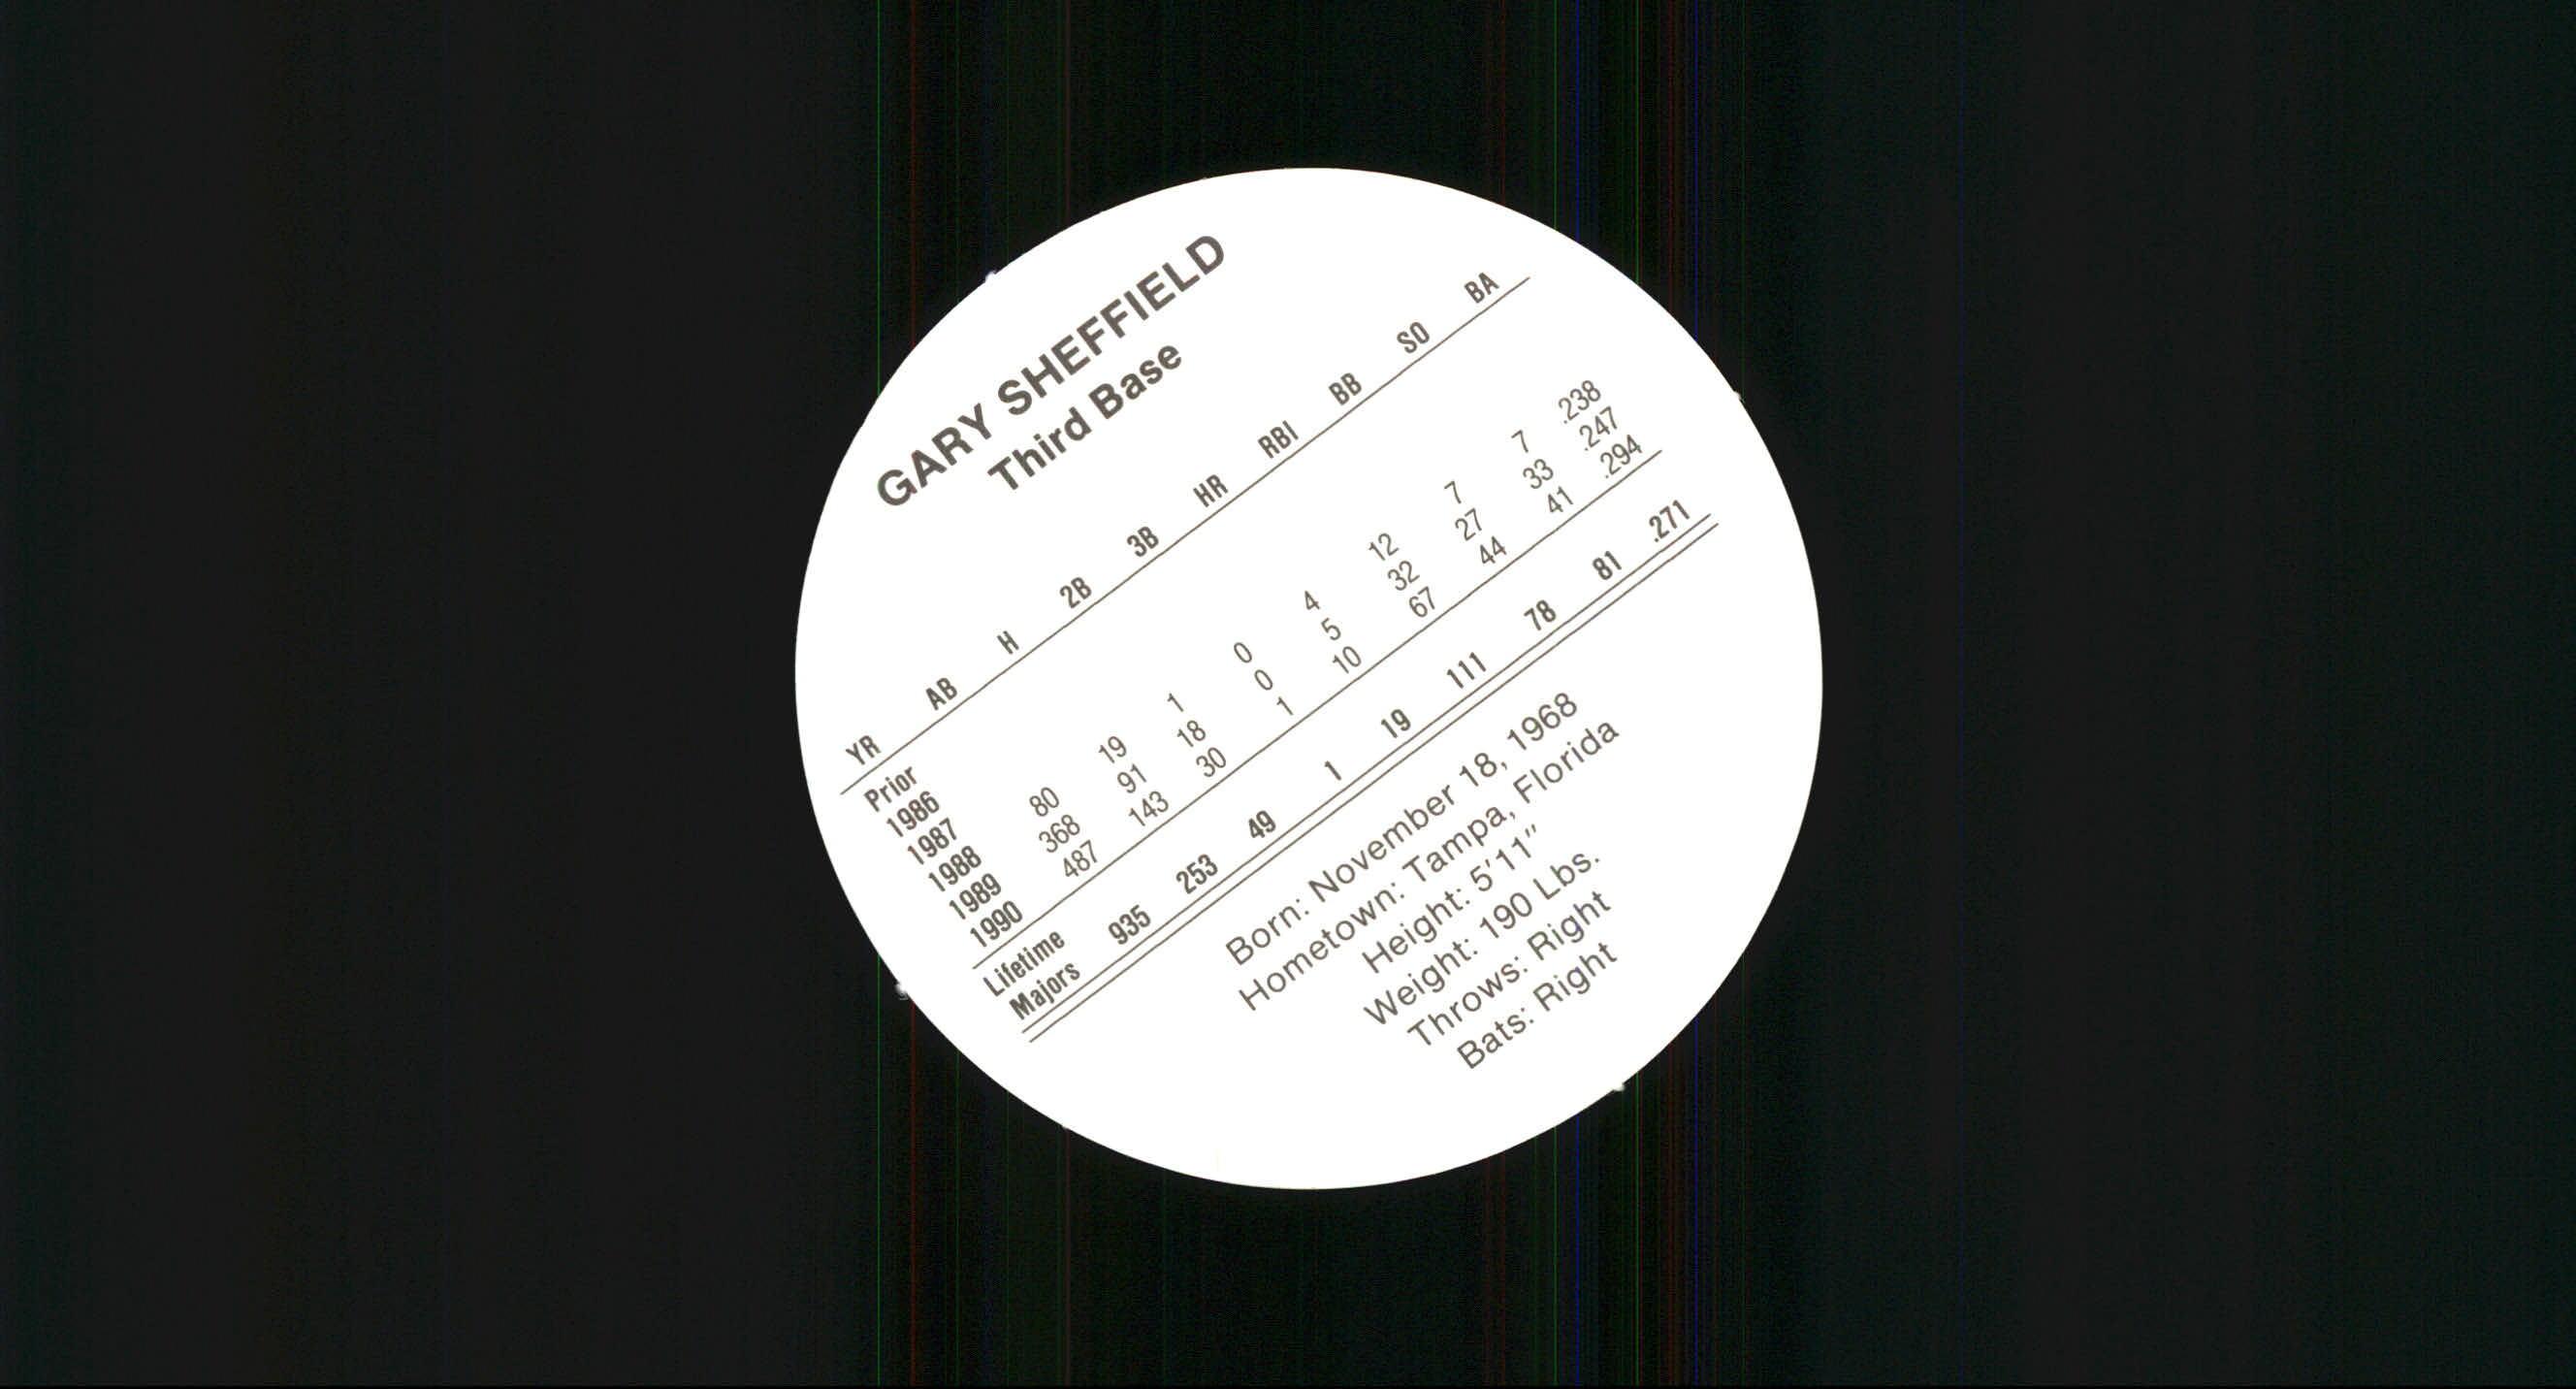 1991 Cadaco Ellis Discs #51 Gary Sheffield back image